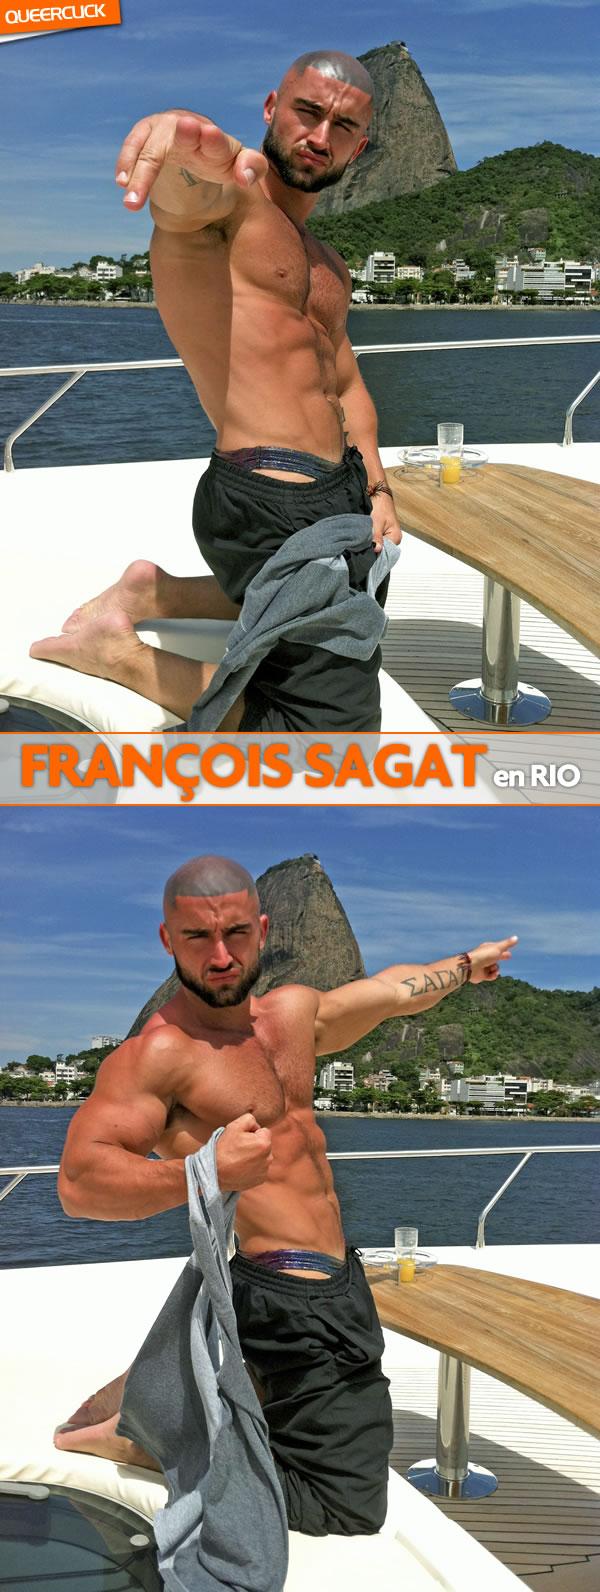 François Sagat en Rio